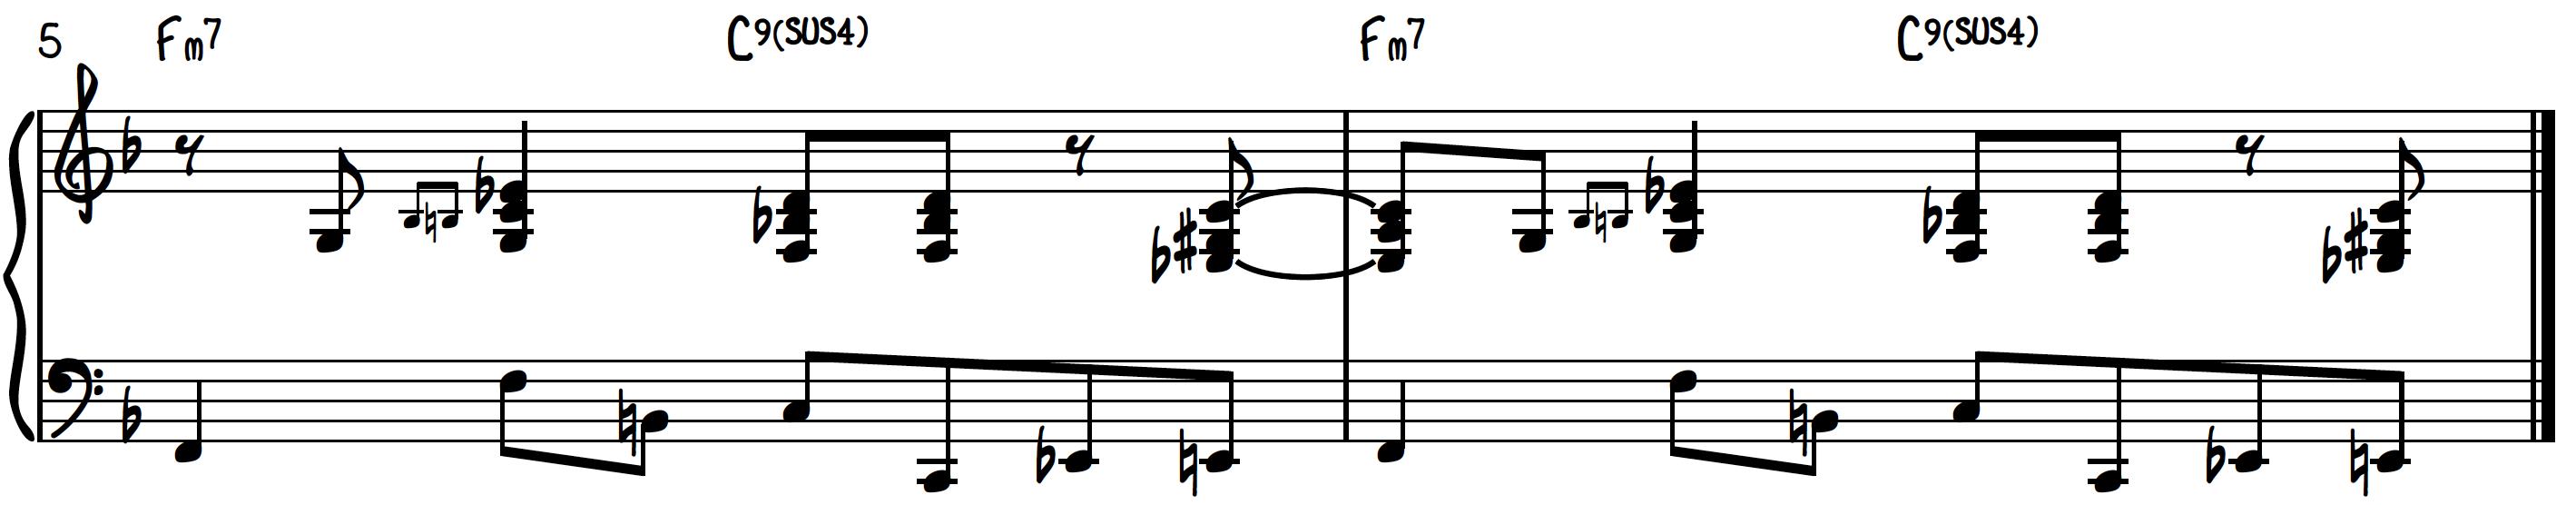 Late Beginner Herbie Hancock Signature Jazz Piano Groove; works on Watermelon Man, Cantaloupe Island, & Chameleon